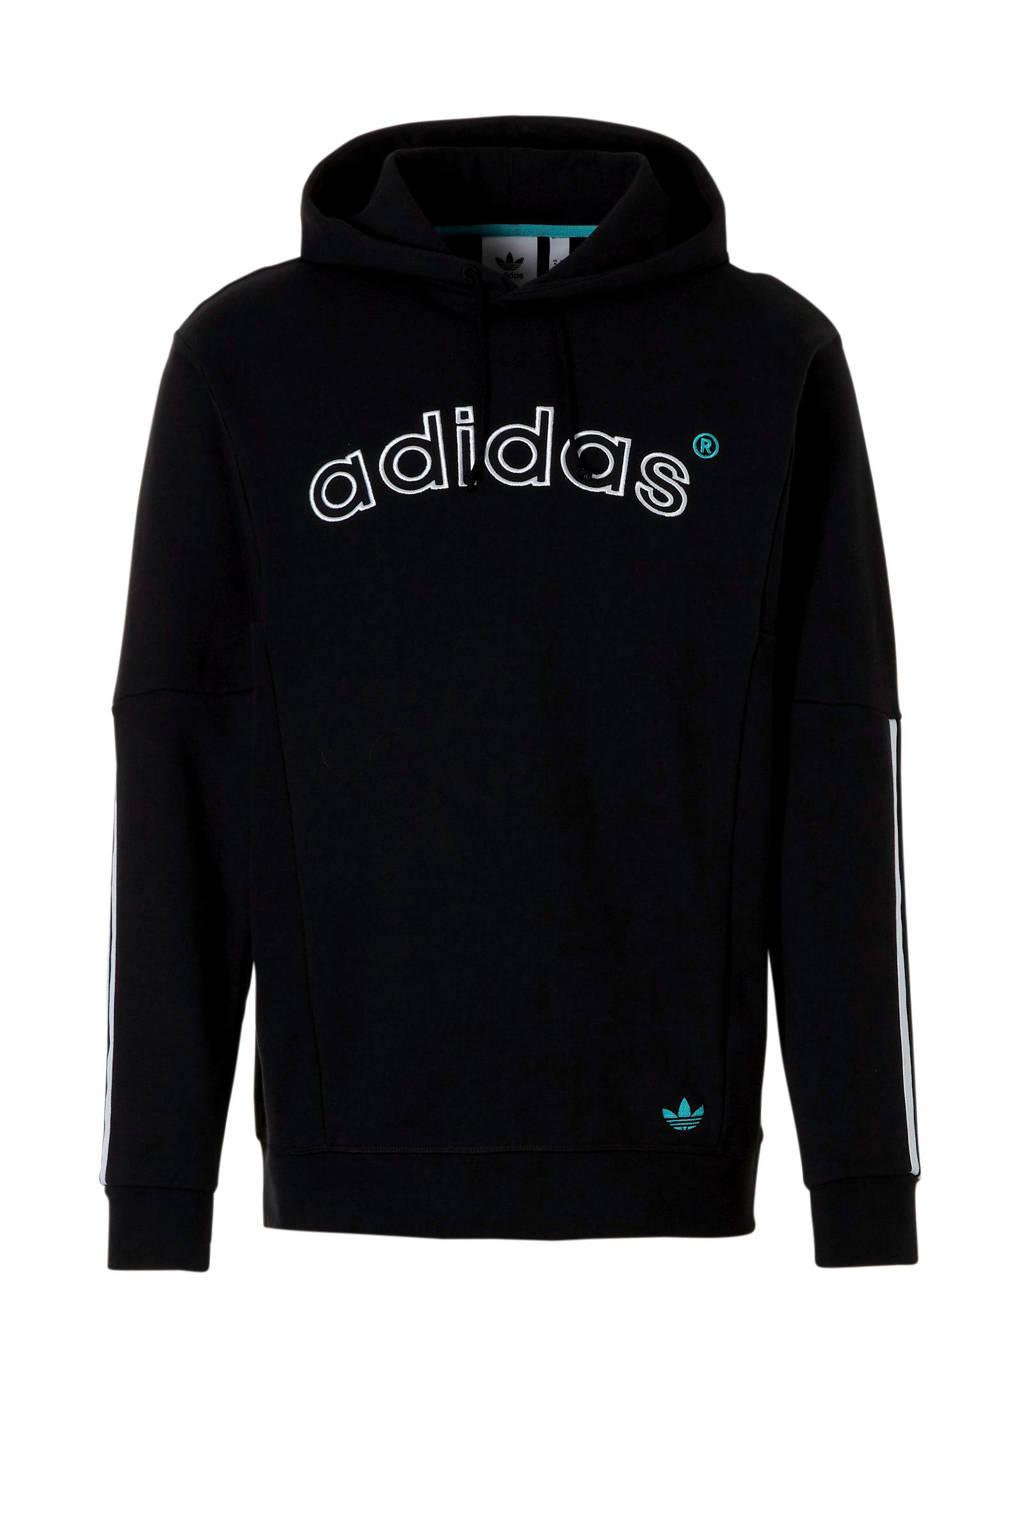 adidas originals hoody zwart/wit, Zwart/wit